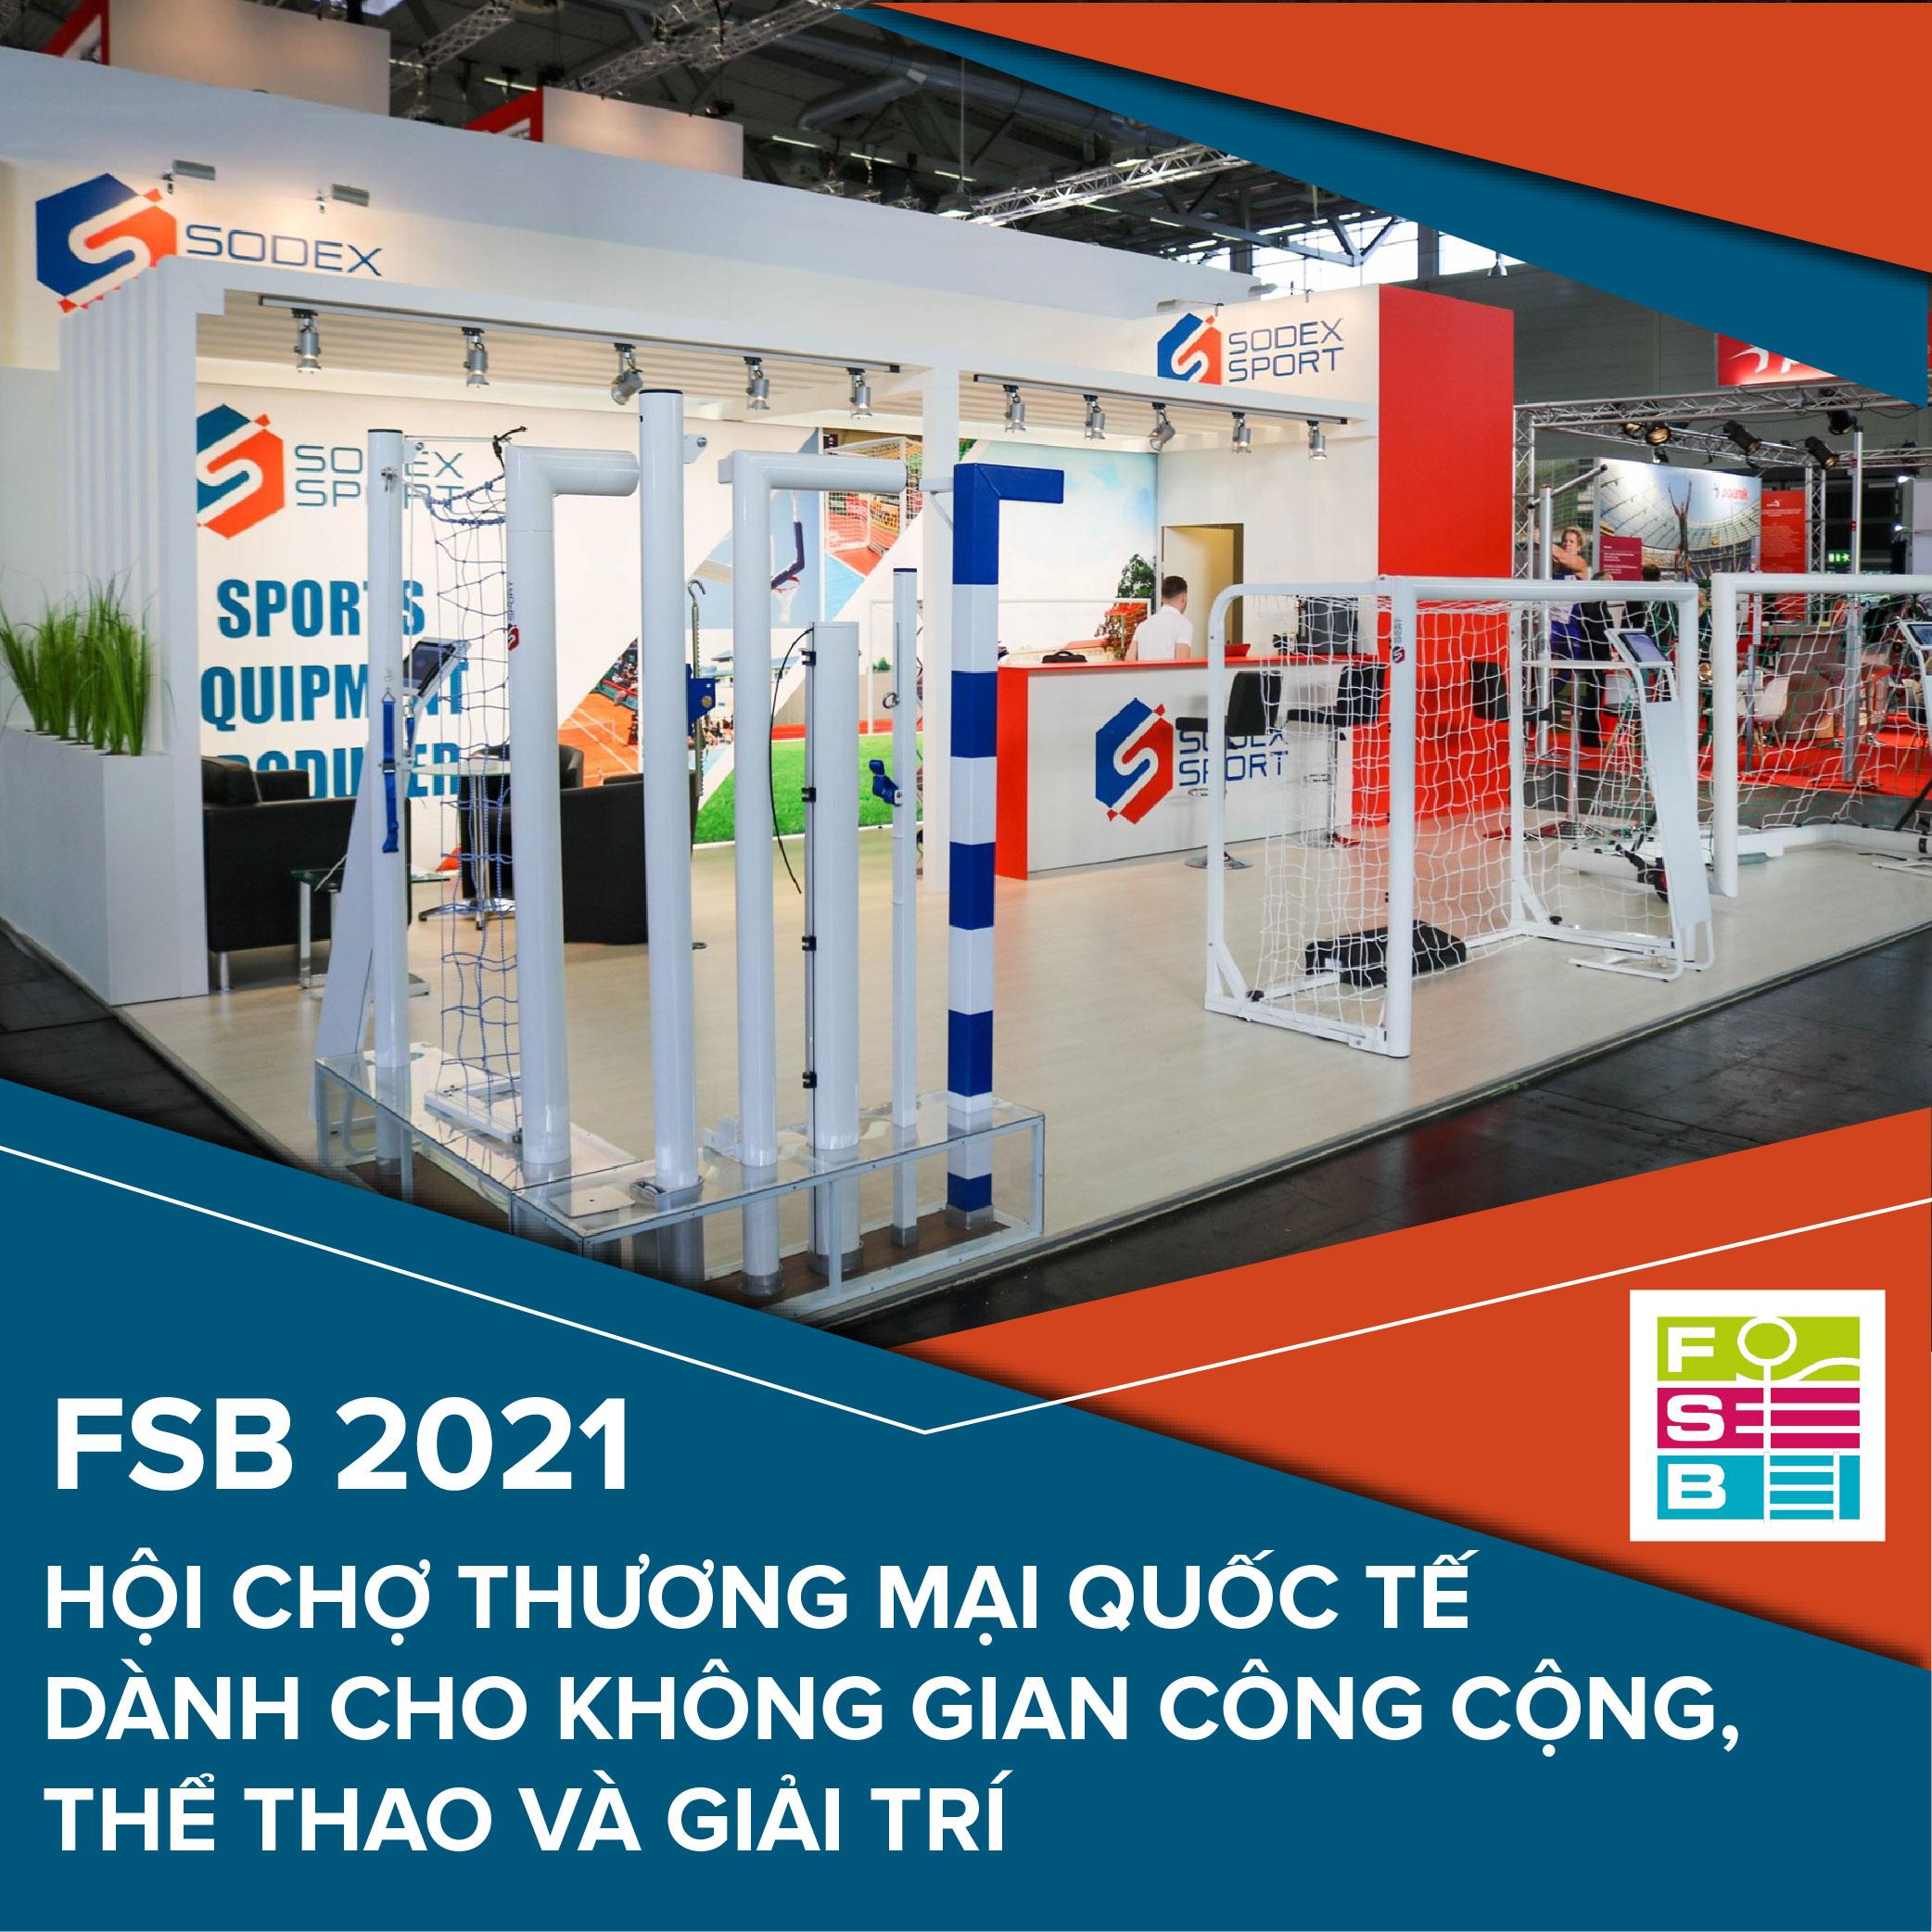 sodex-sport-tham-du-FSB-2021-1